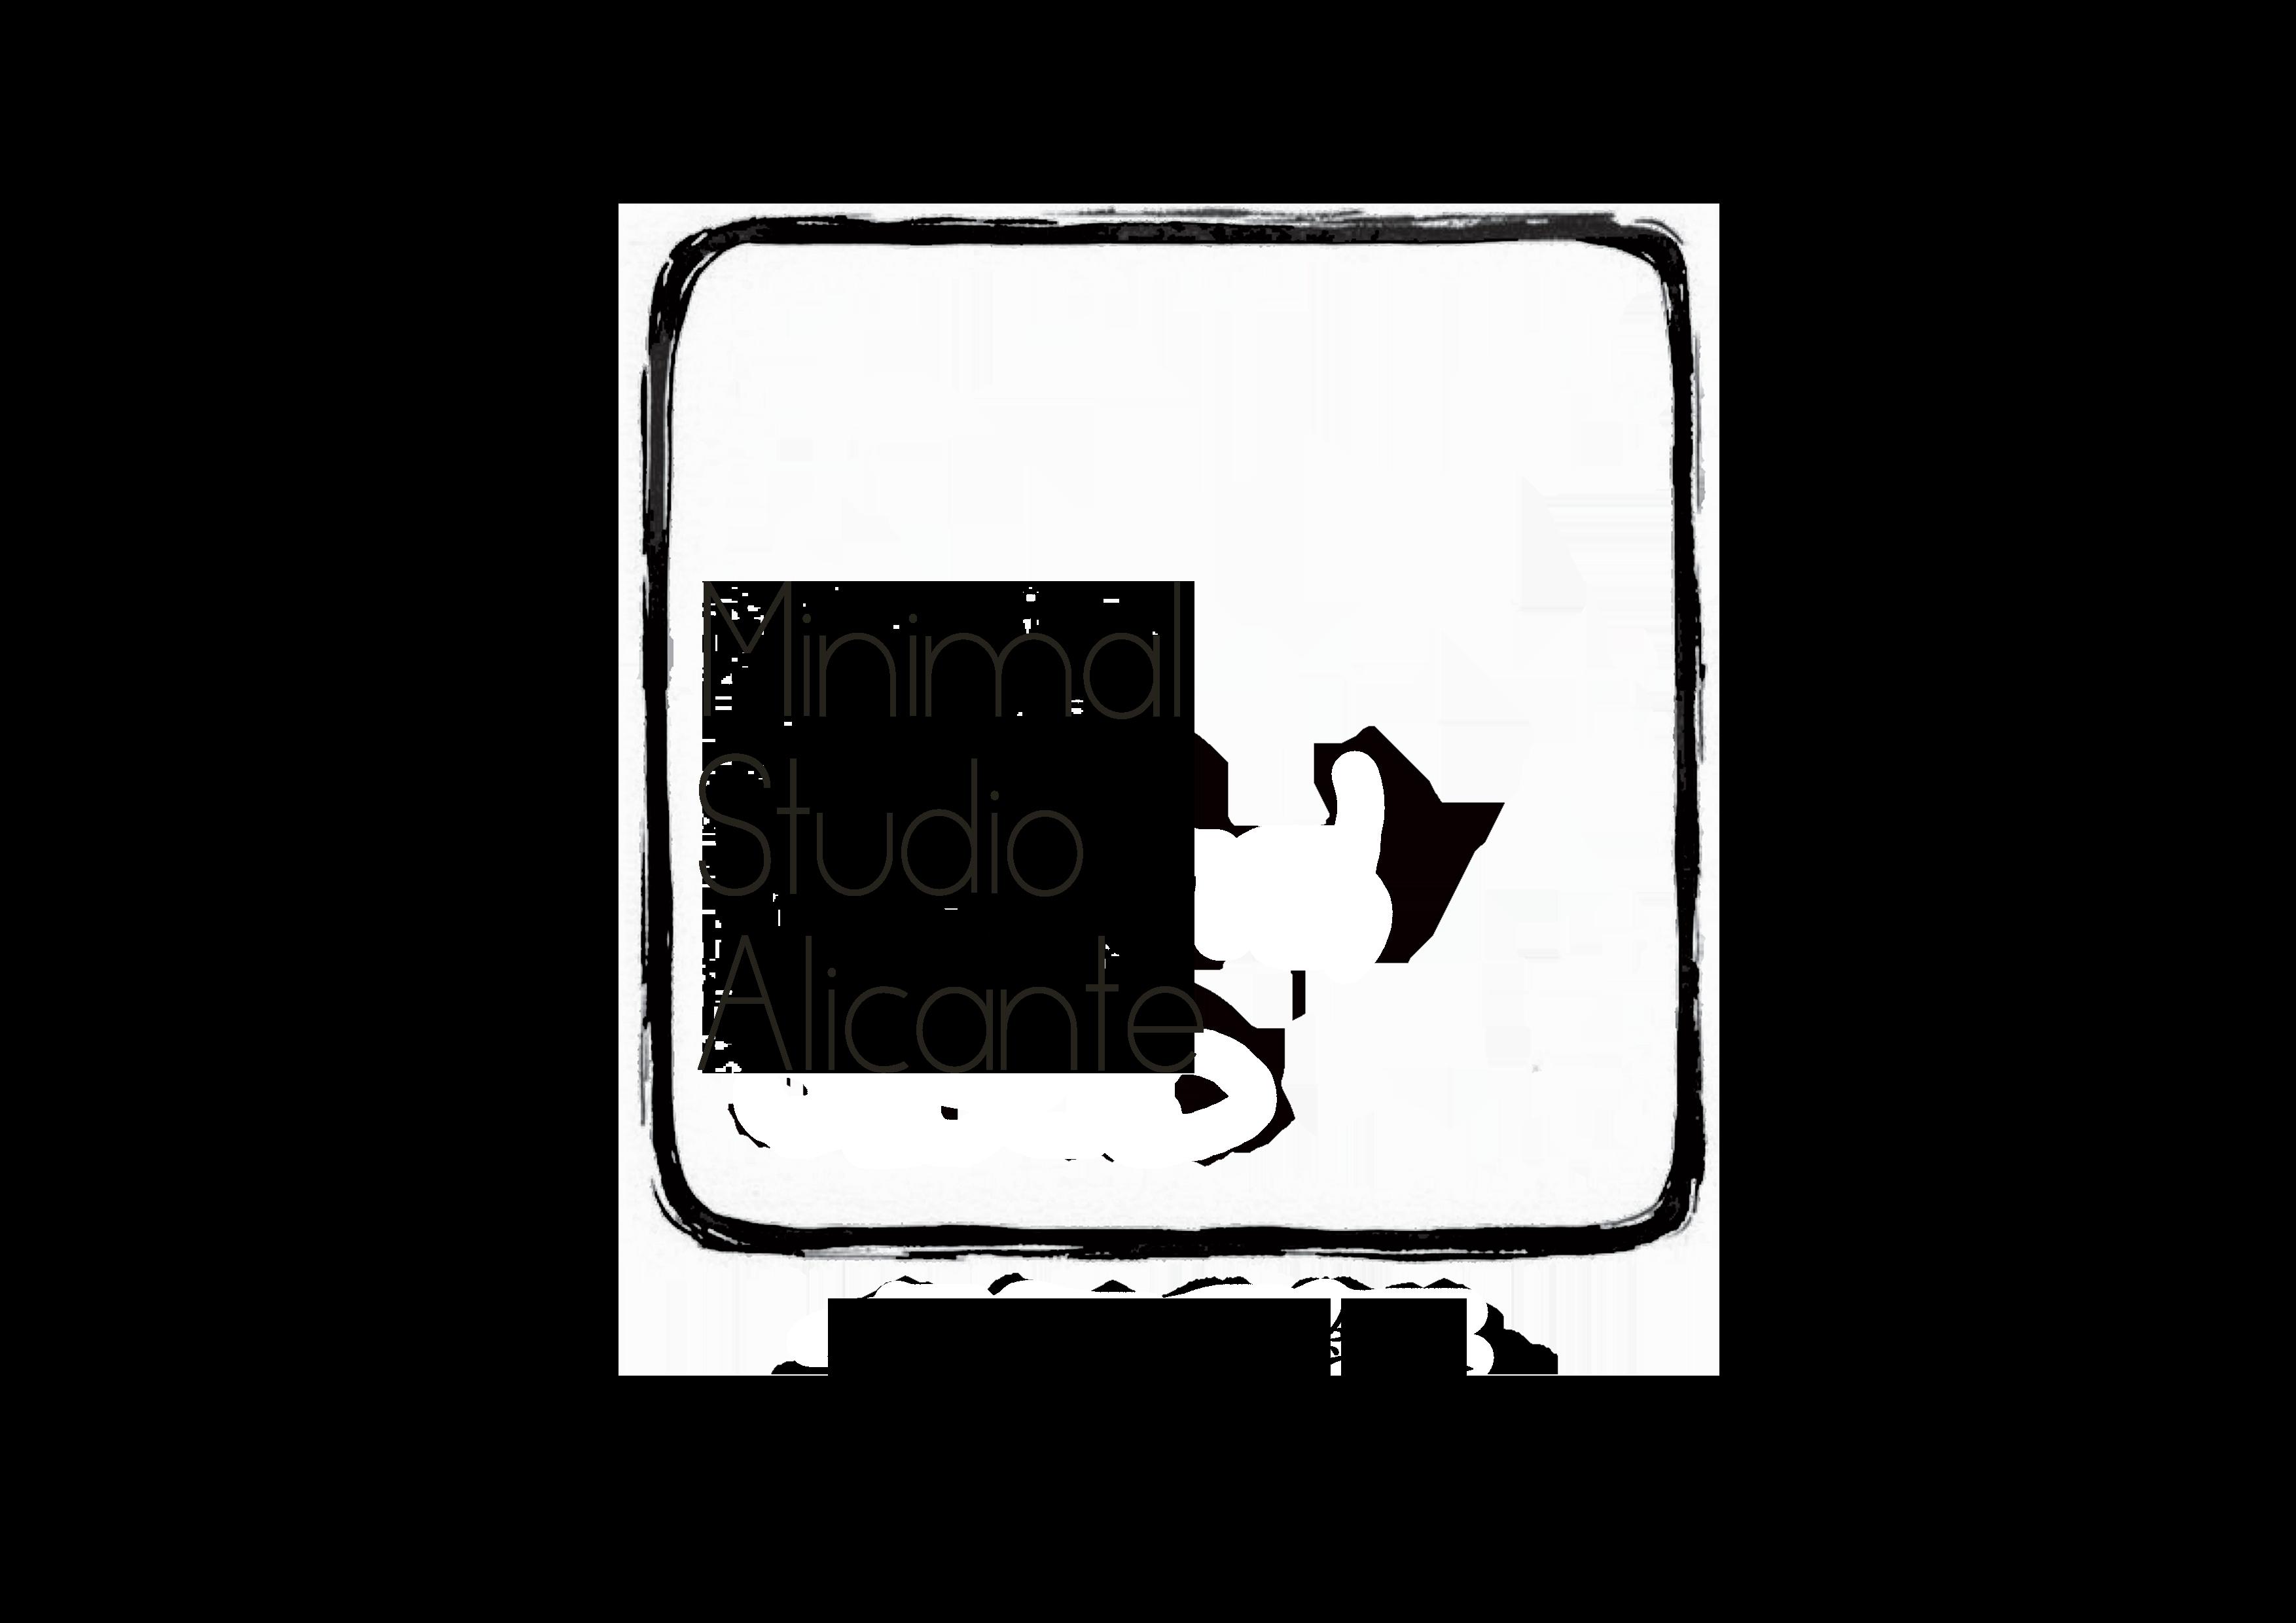 Minimal Studio Alicante